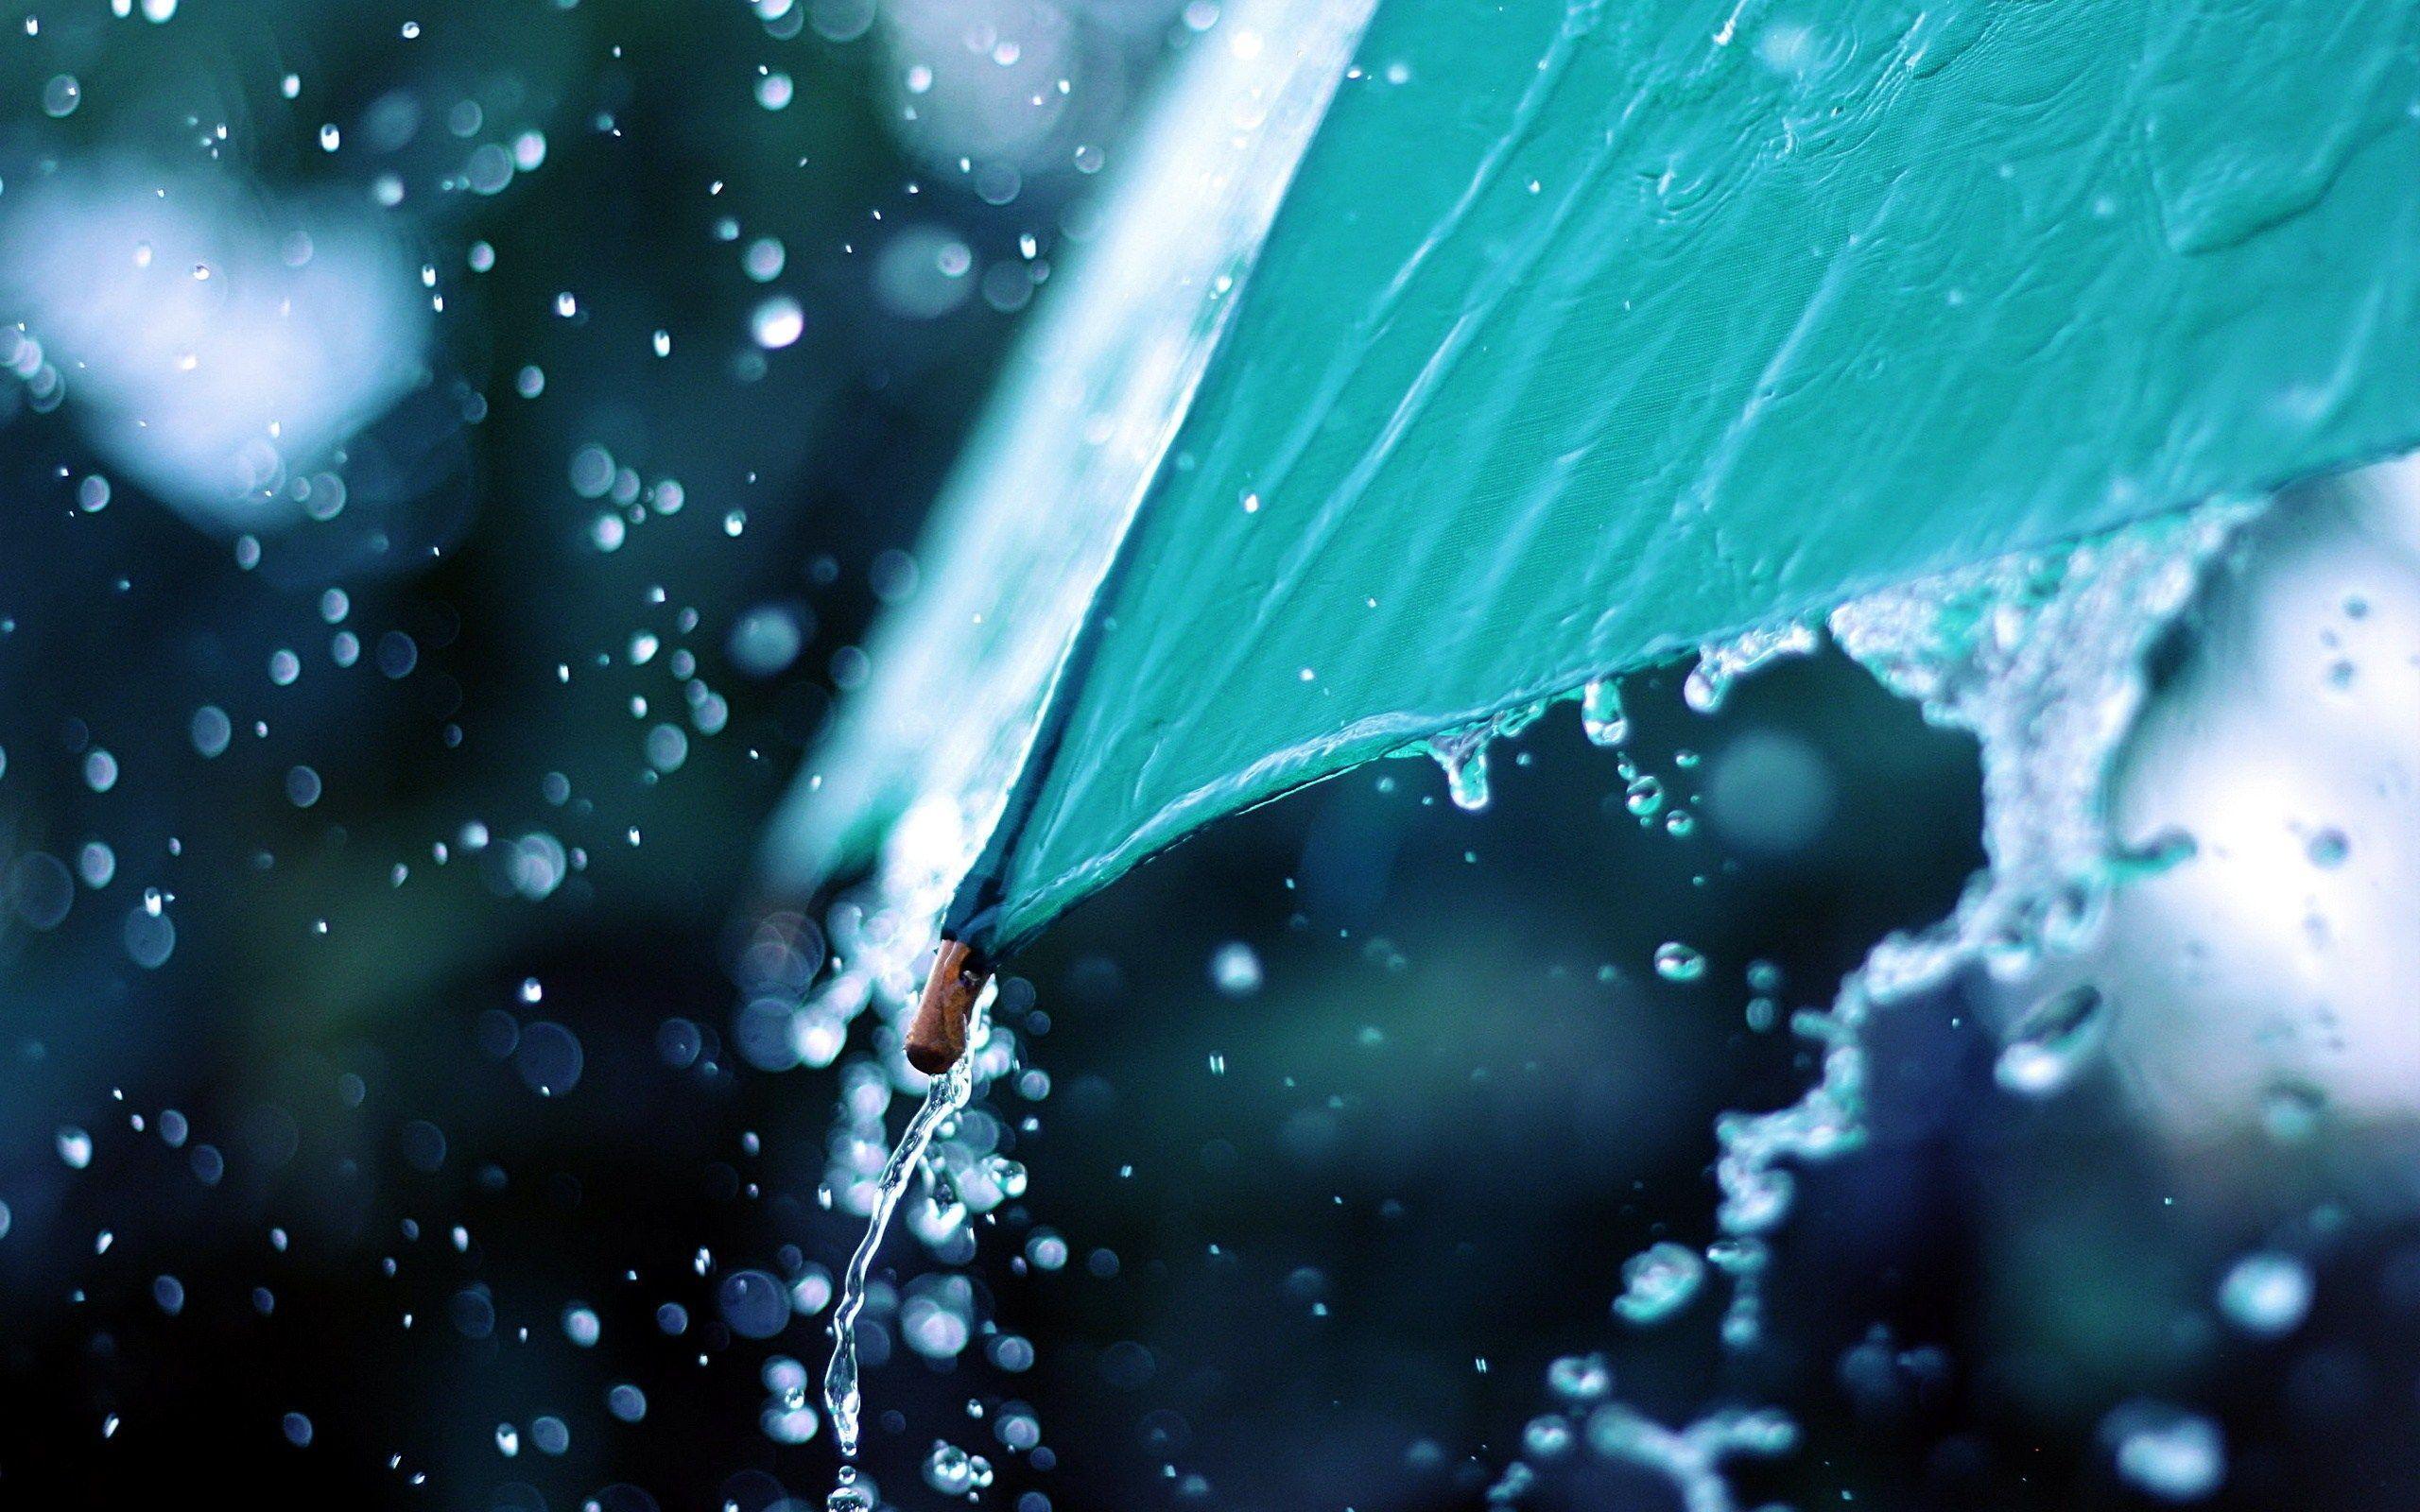 Water Flows From Umbrella Rain HD Wallpaper - ZoomWalls